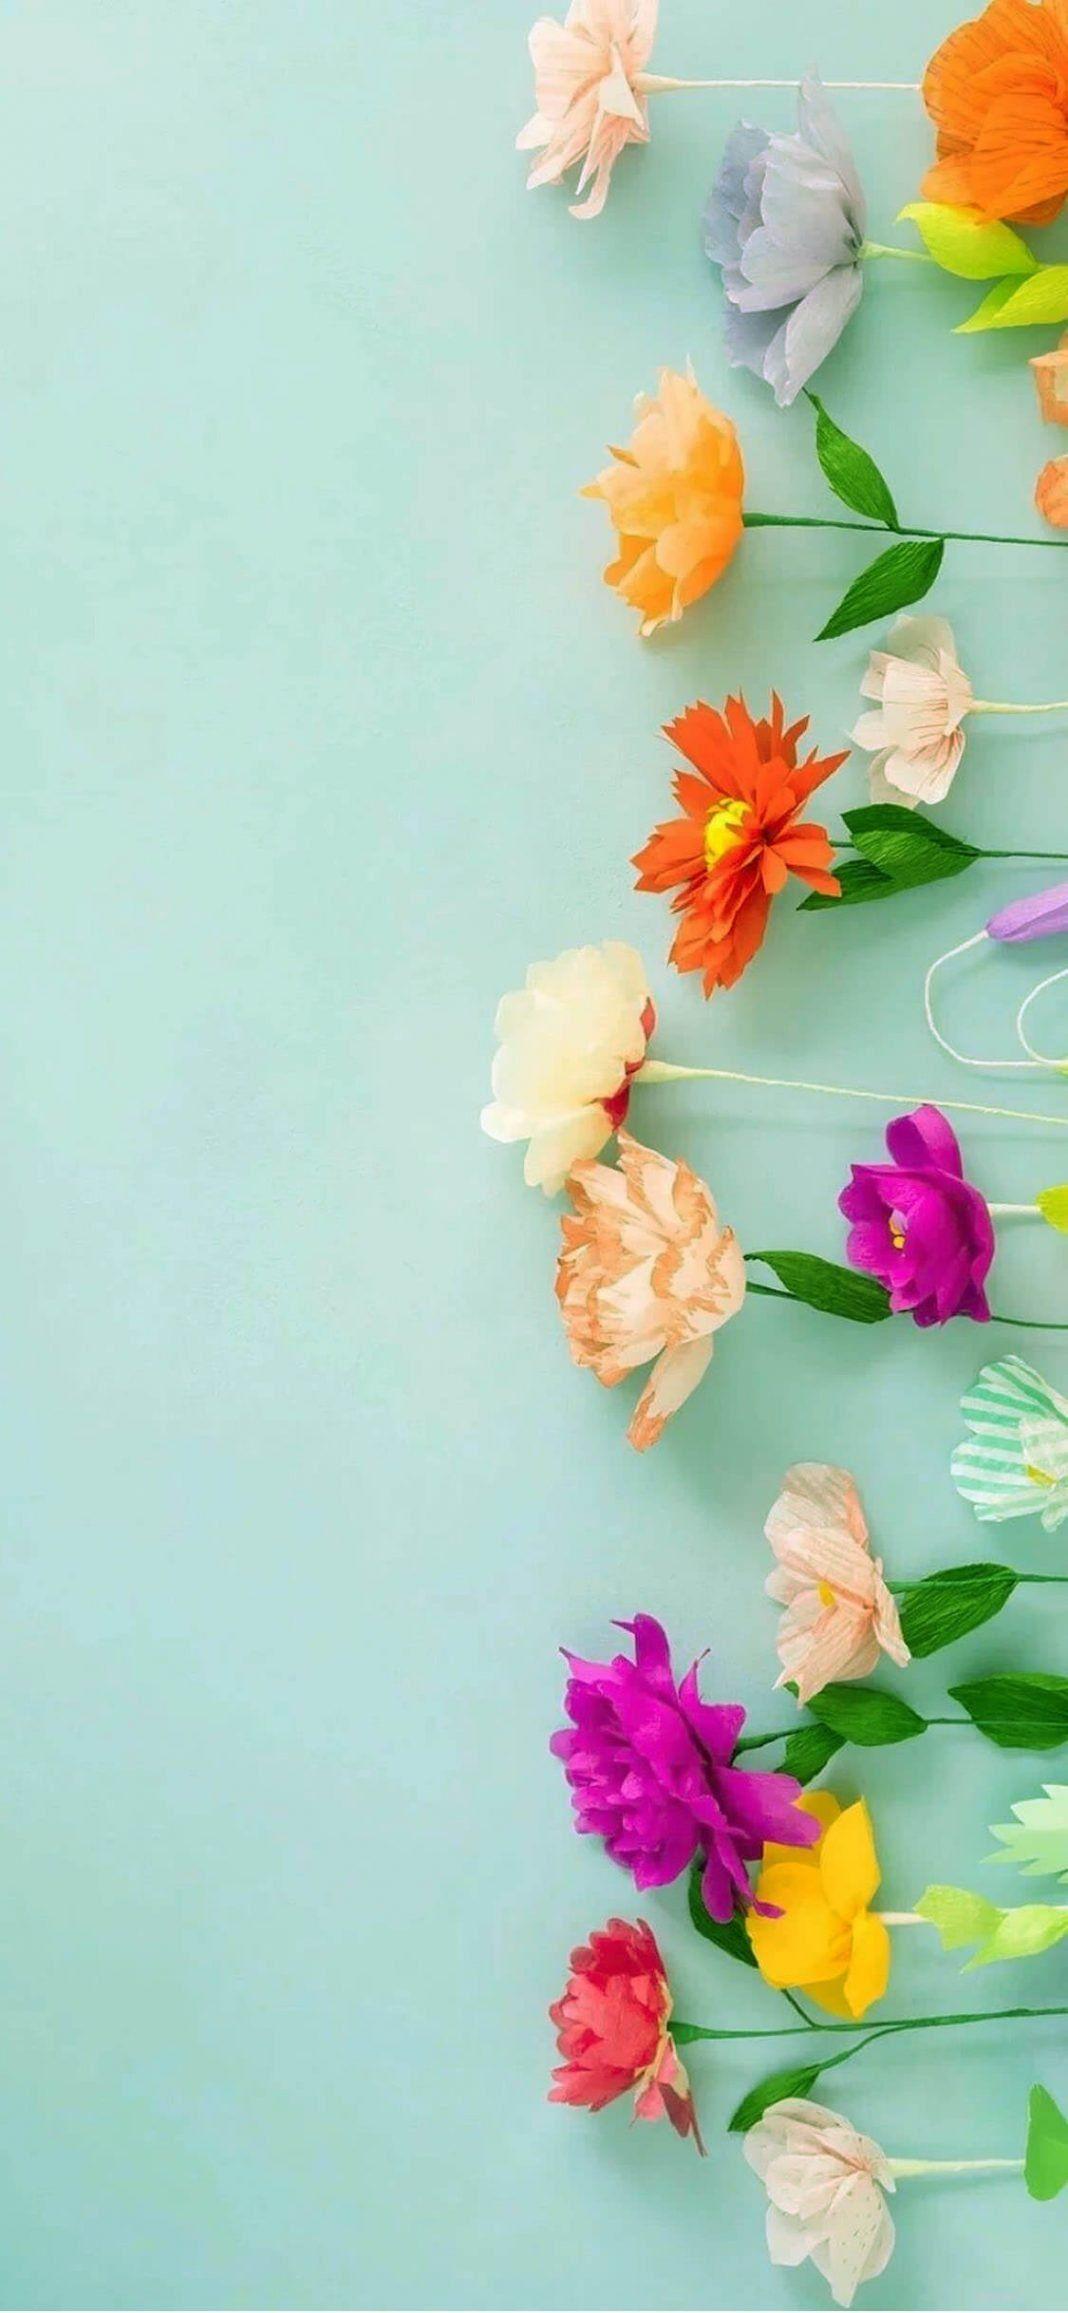 28 Best Flowers Iphone Wallpapers Backgrounds Templatefor In 2021 Blumen Wallpaper Blumen Hintergrundbilder Cute flower wallpaper hd